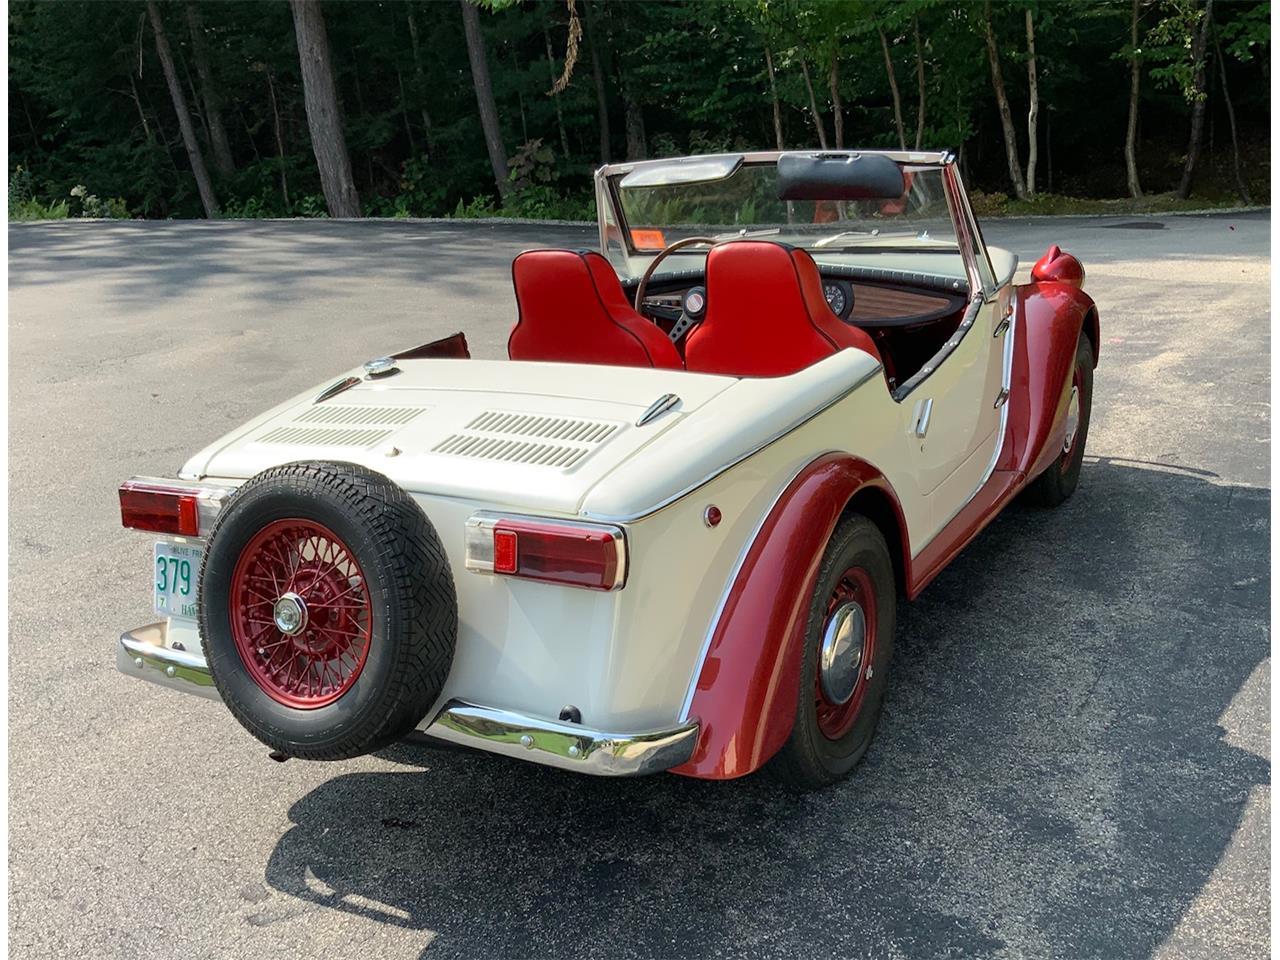 1969 Siata Spring (CC-1392647) for sale in Bartlett, New Hampshire